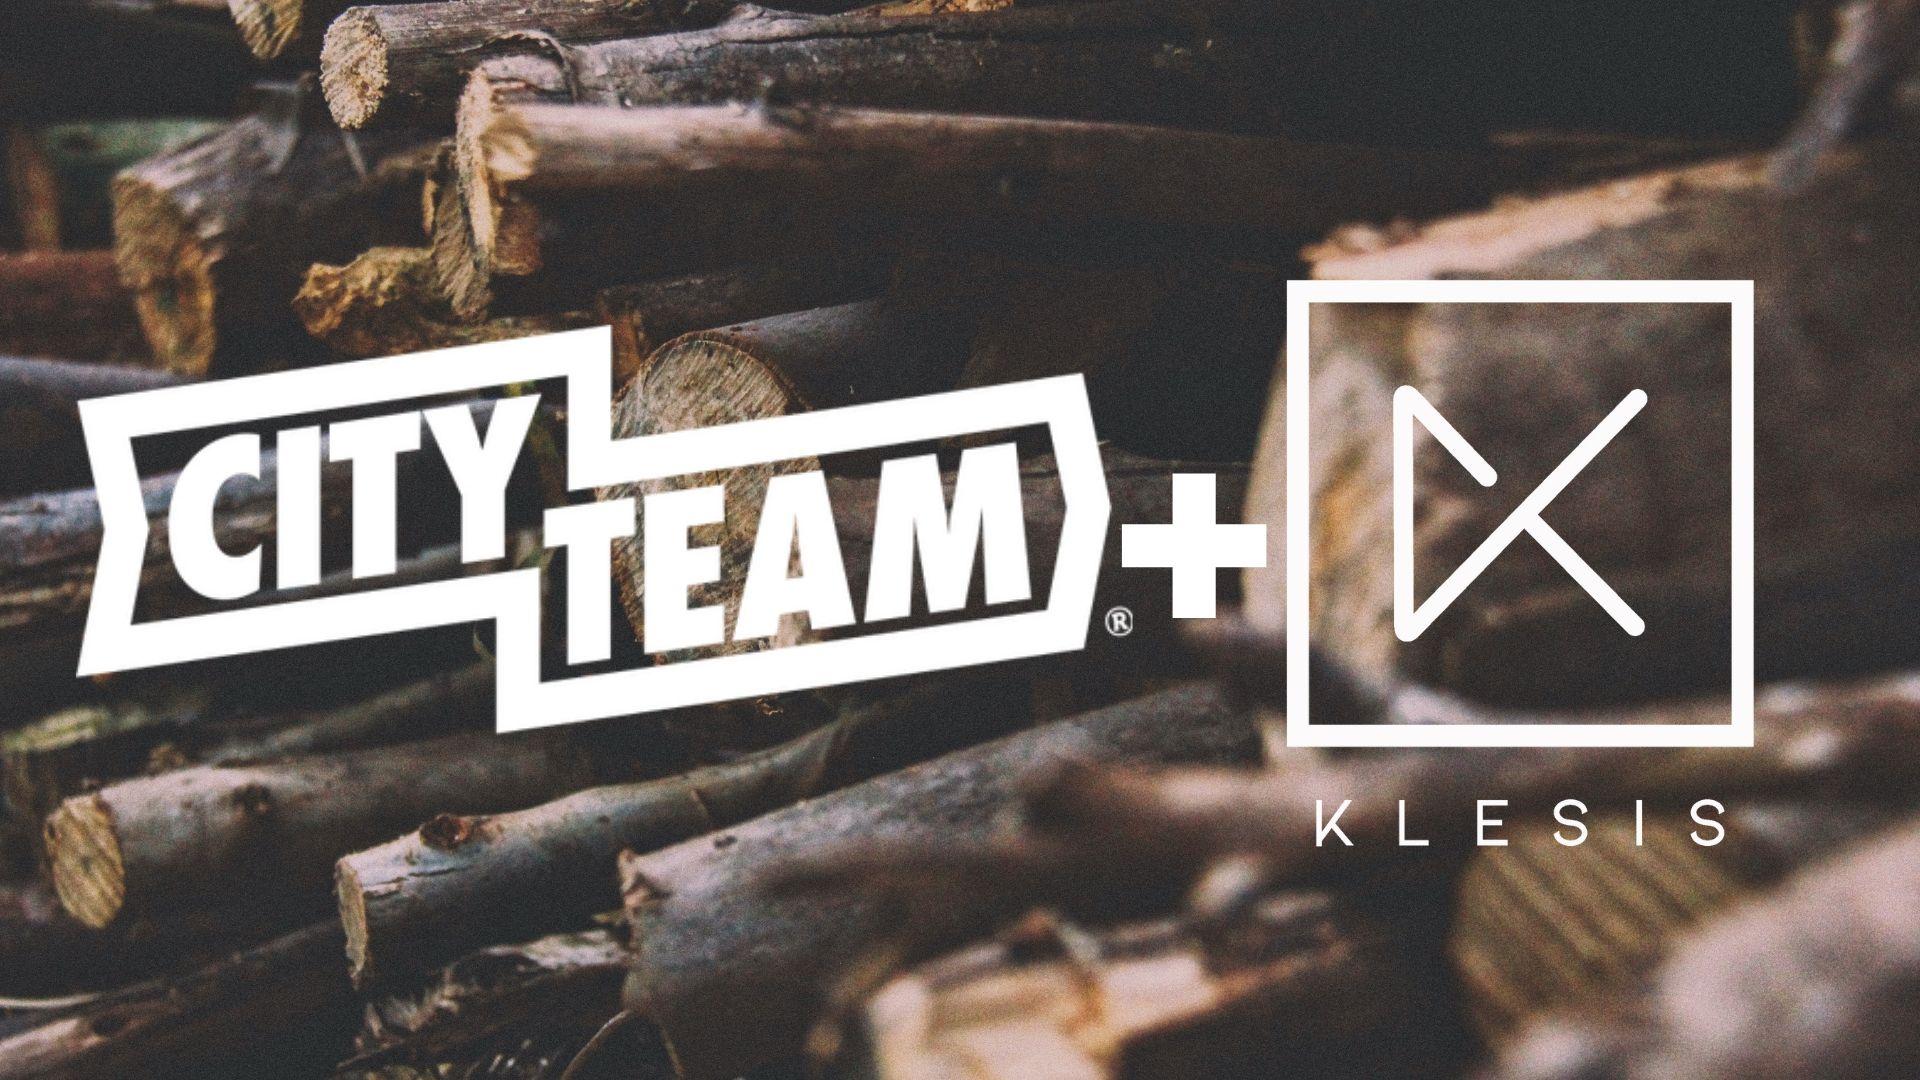 Cityteam_with_klesis_berkeley_in_oakland